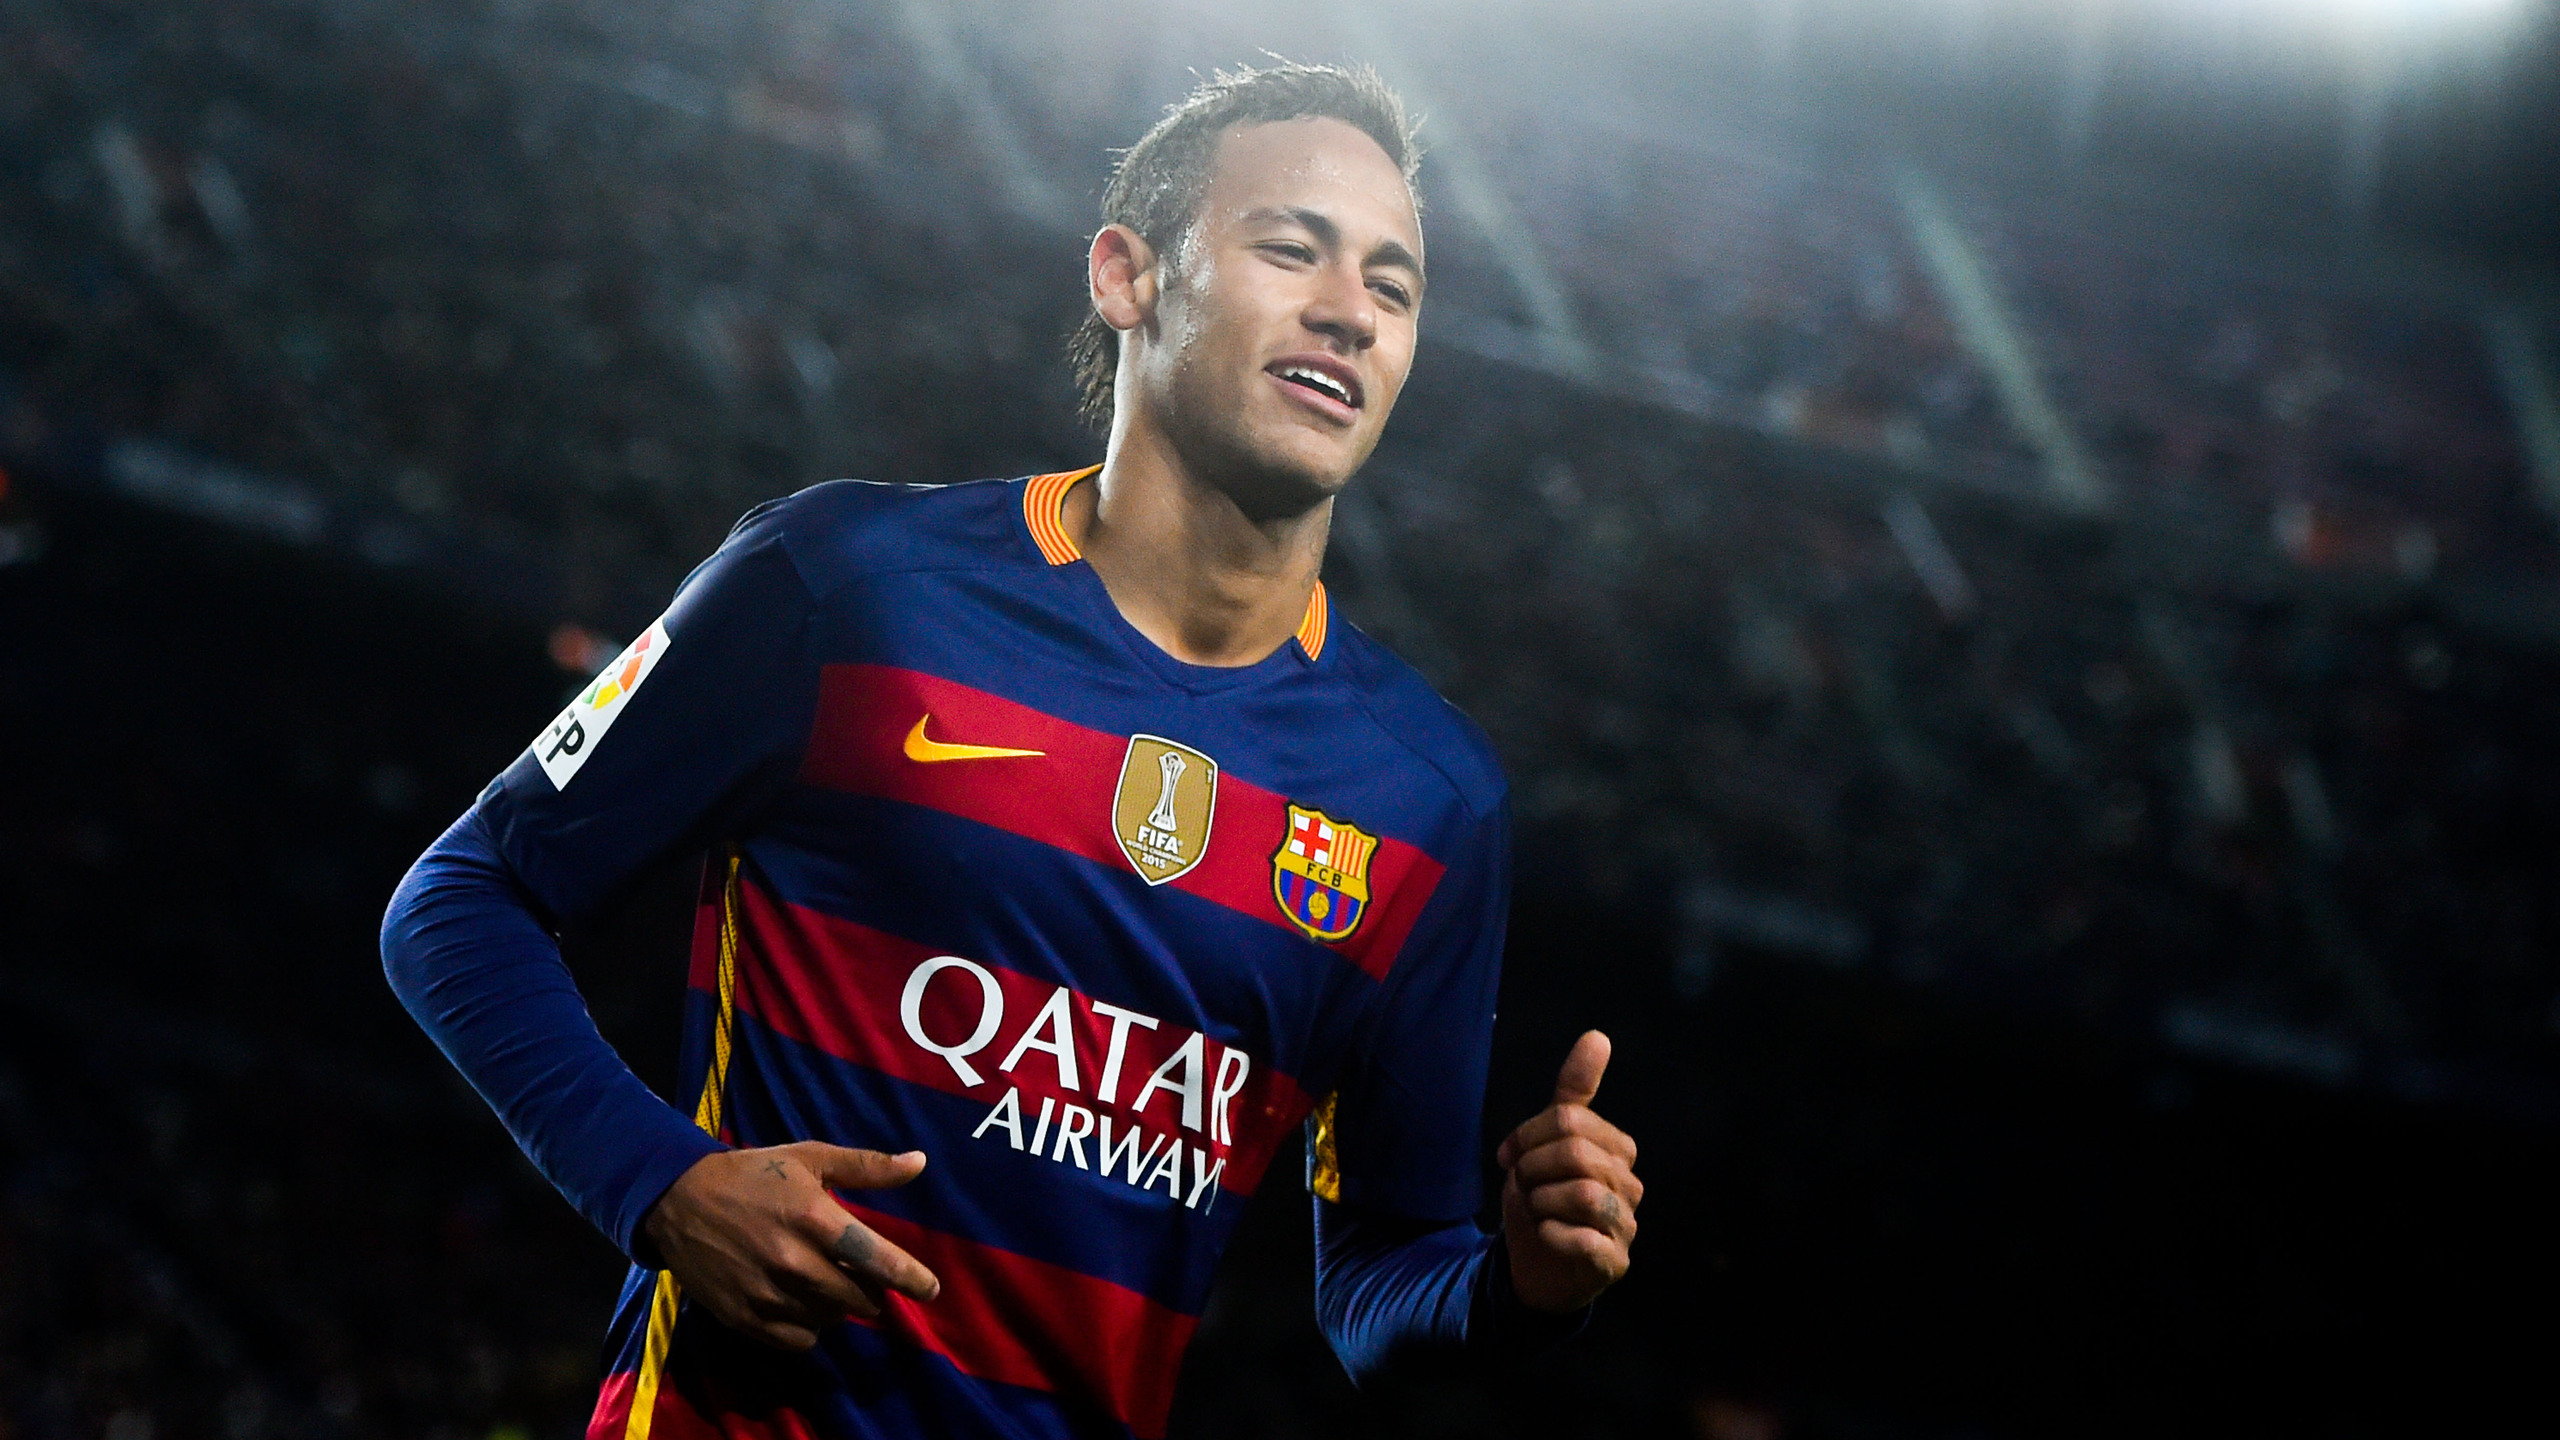 2560x1440 Neymar 1440P Resolution HD 4k Wallpapers, Images ...